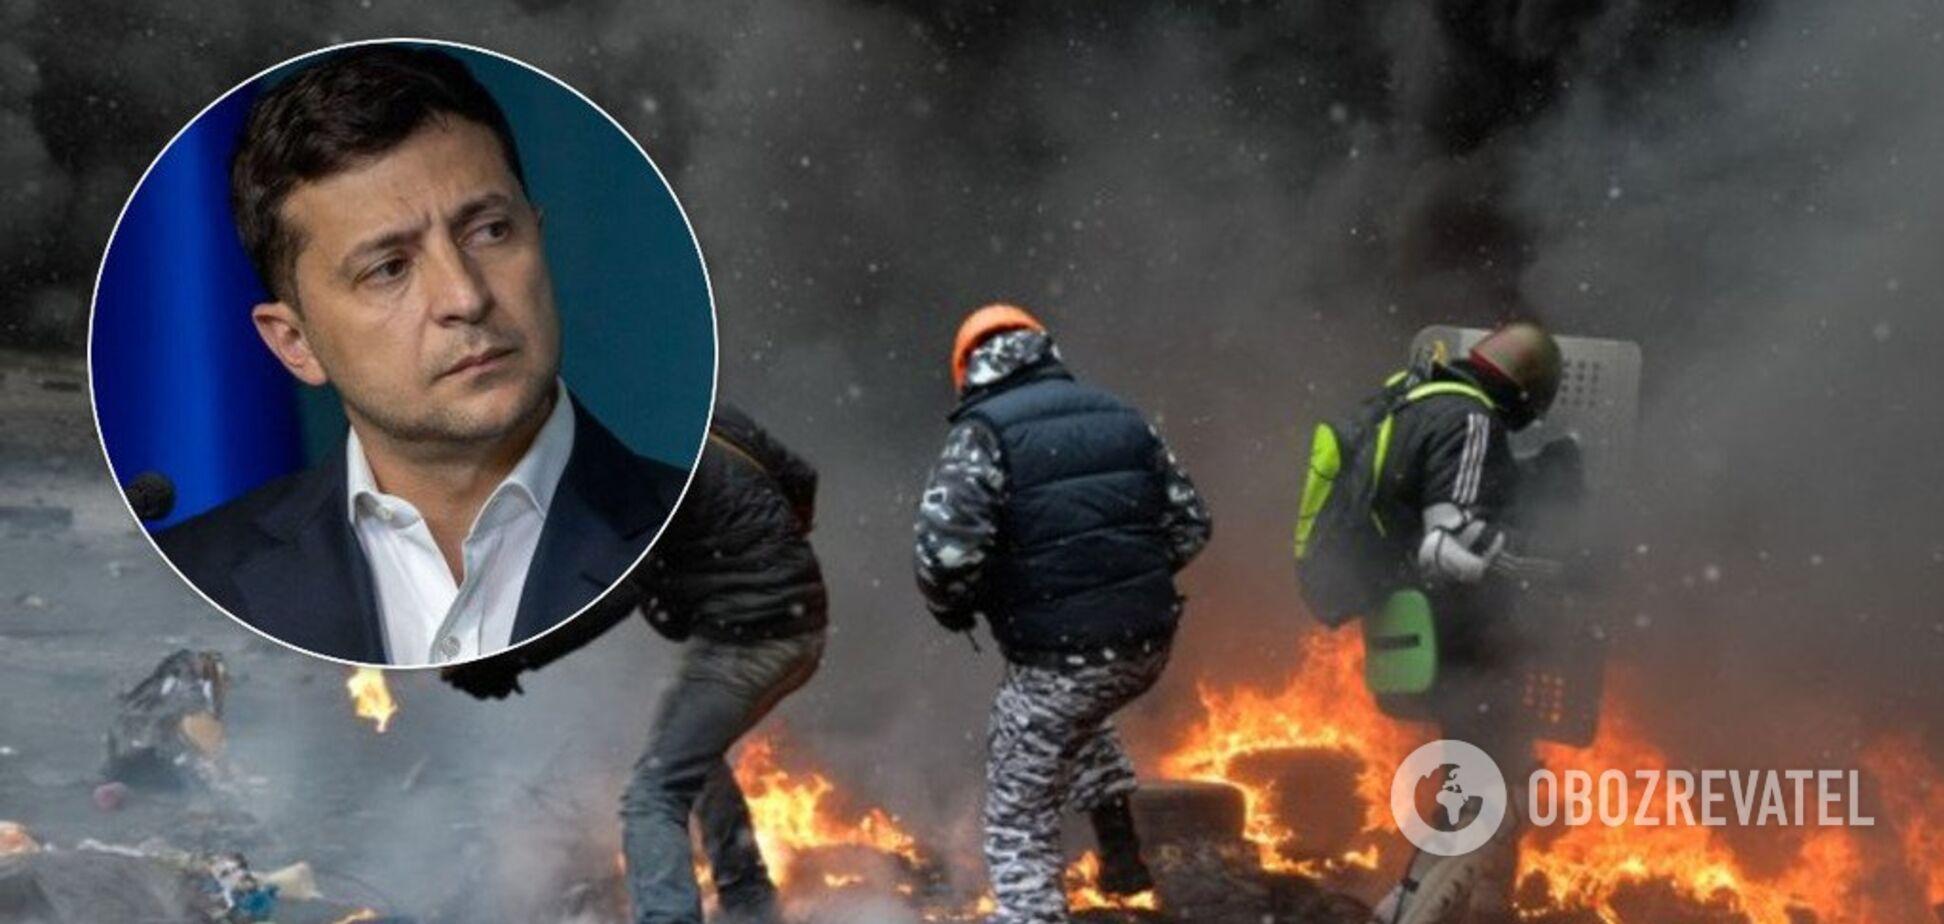 Ошибку не простят: Киселев предупредил Зеленского об опасности